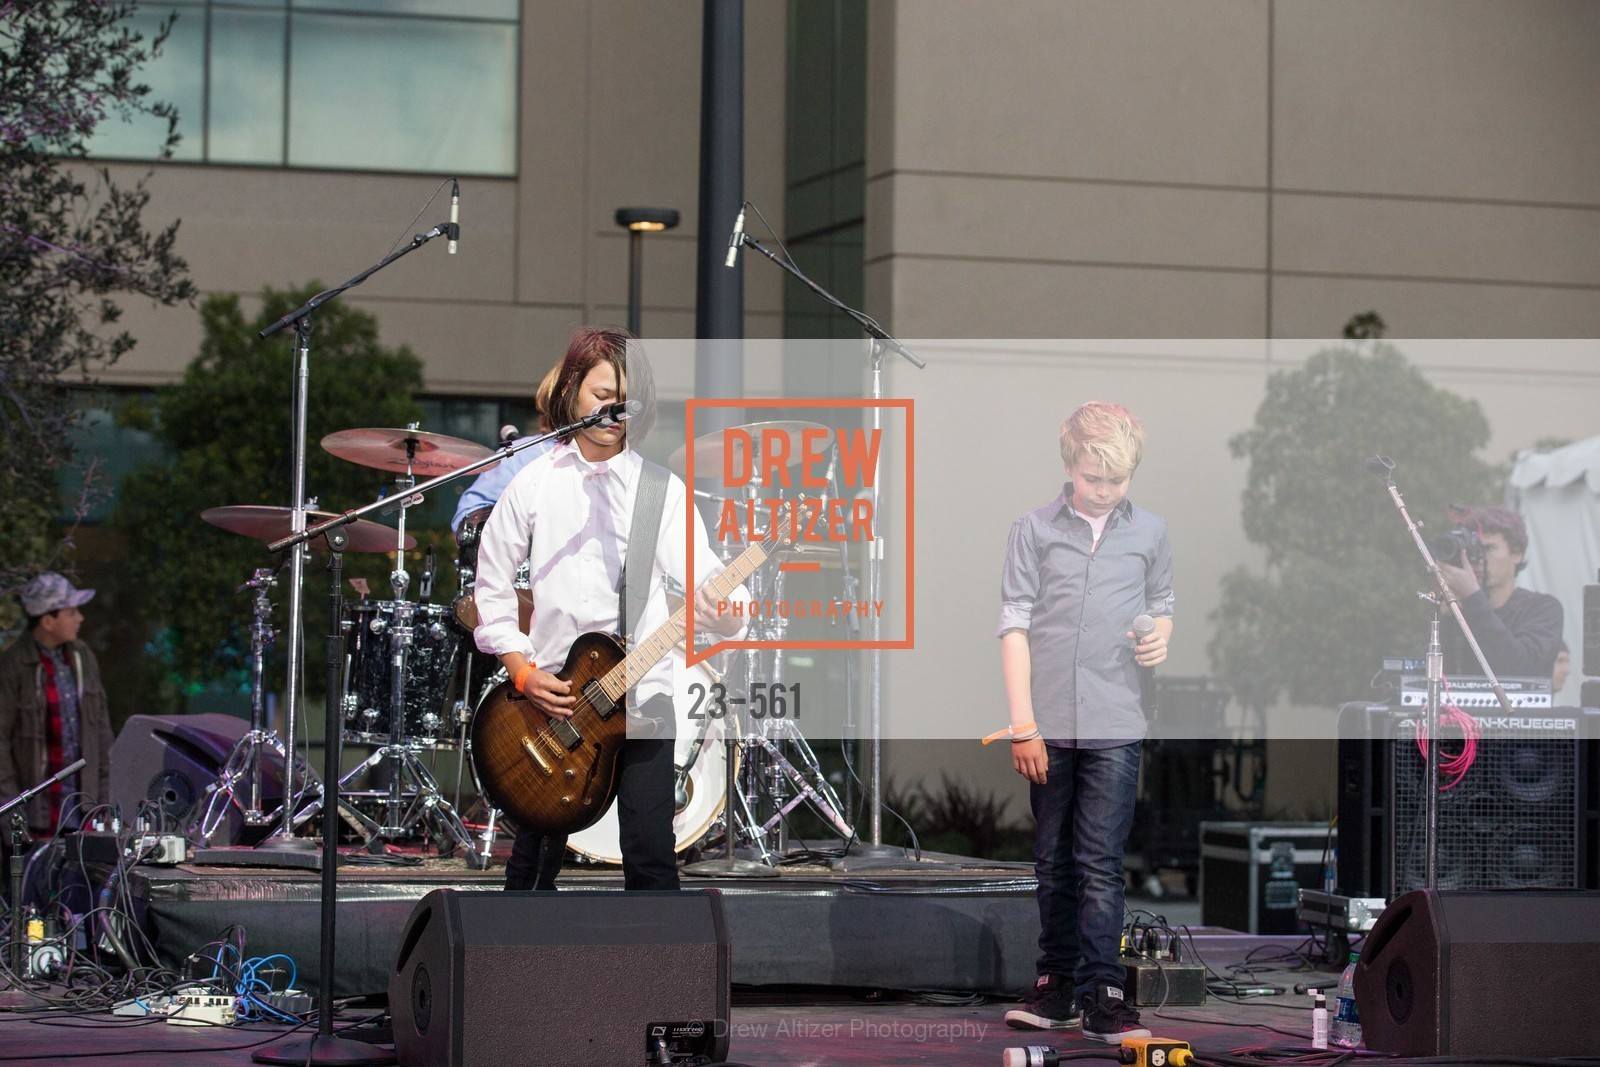 Performance By WJM, Photo #23-561